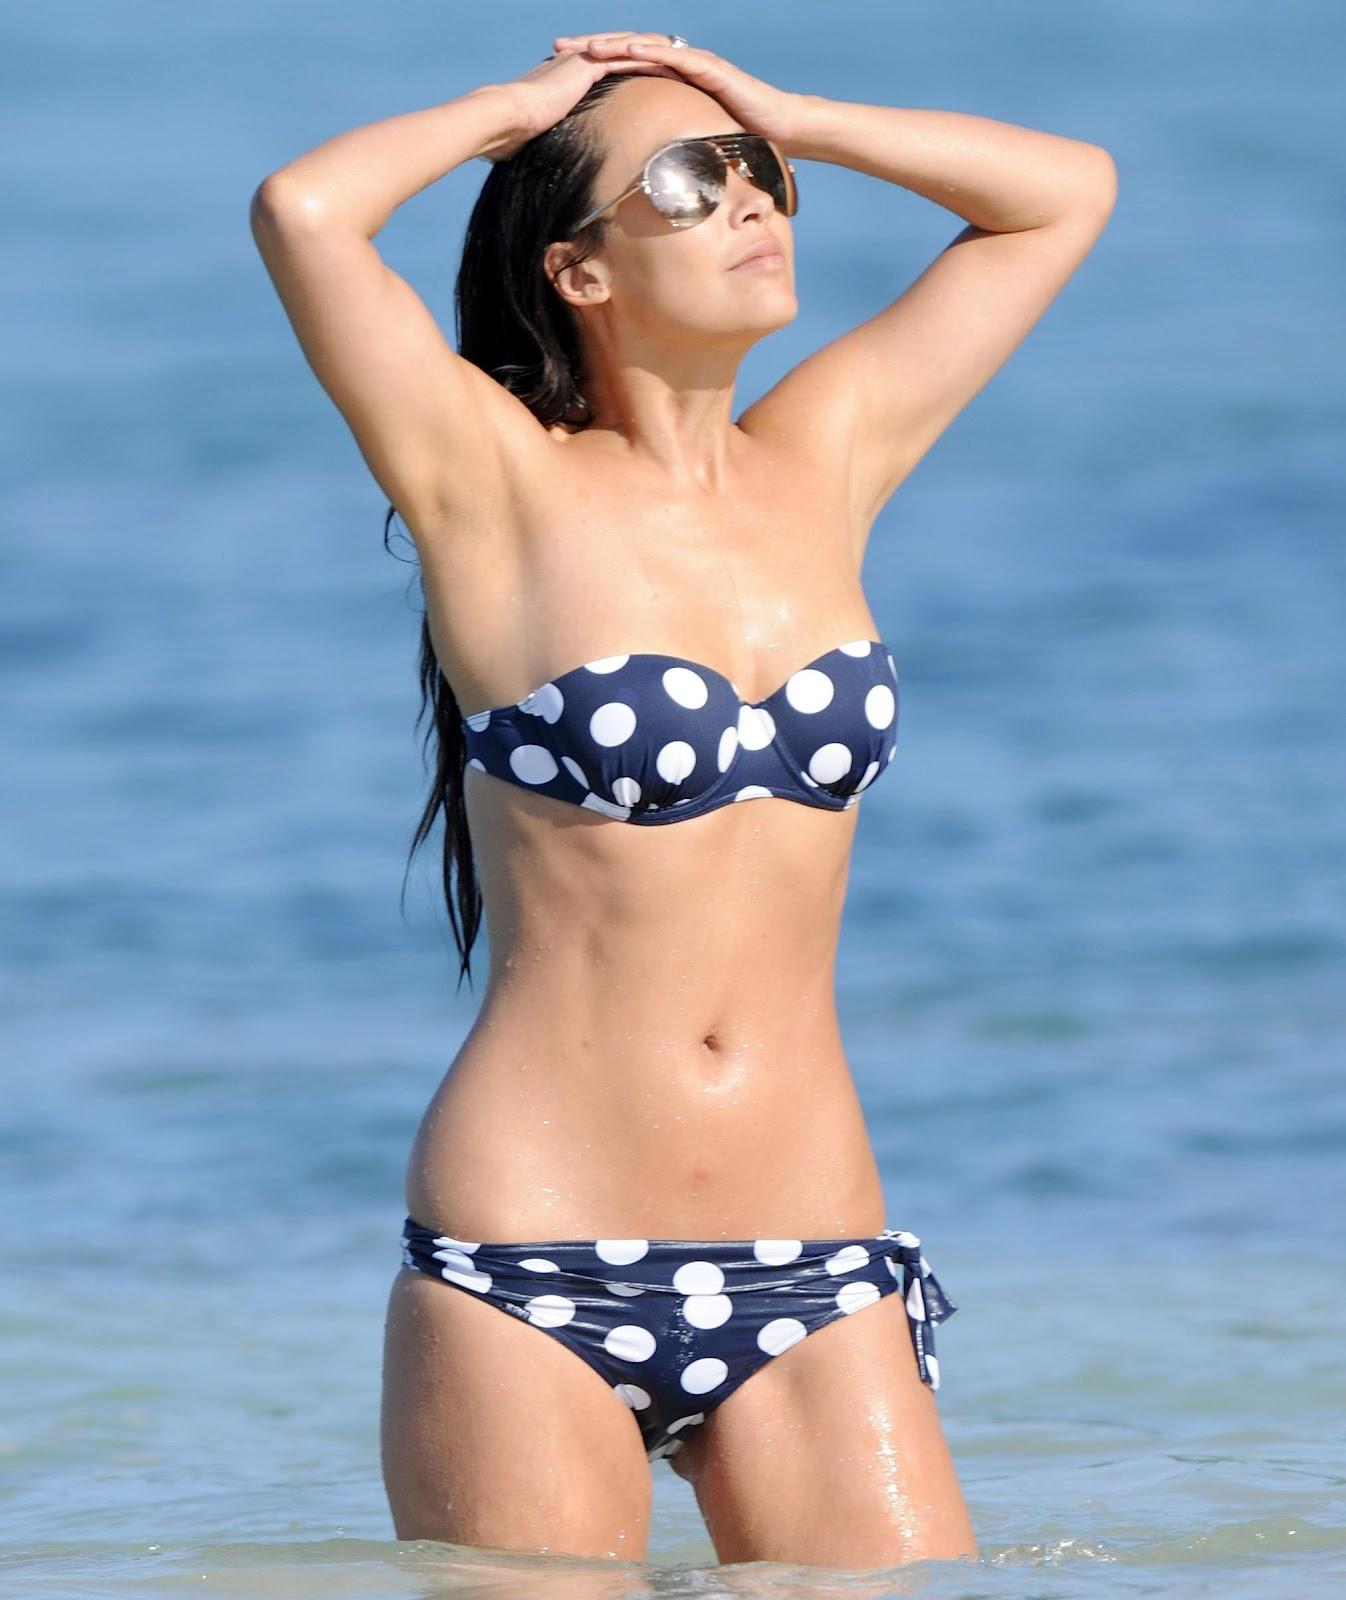 http://4.bp.blogspot.com/-WXb-nyDHLog/UEo19dvAIAI/AAAAAAAAIjc/AhKtDiD2u80/s1600/myleene_klass_caribbean_bikini_6th_january_2012__cufdW7Q.jpg